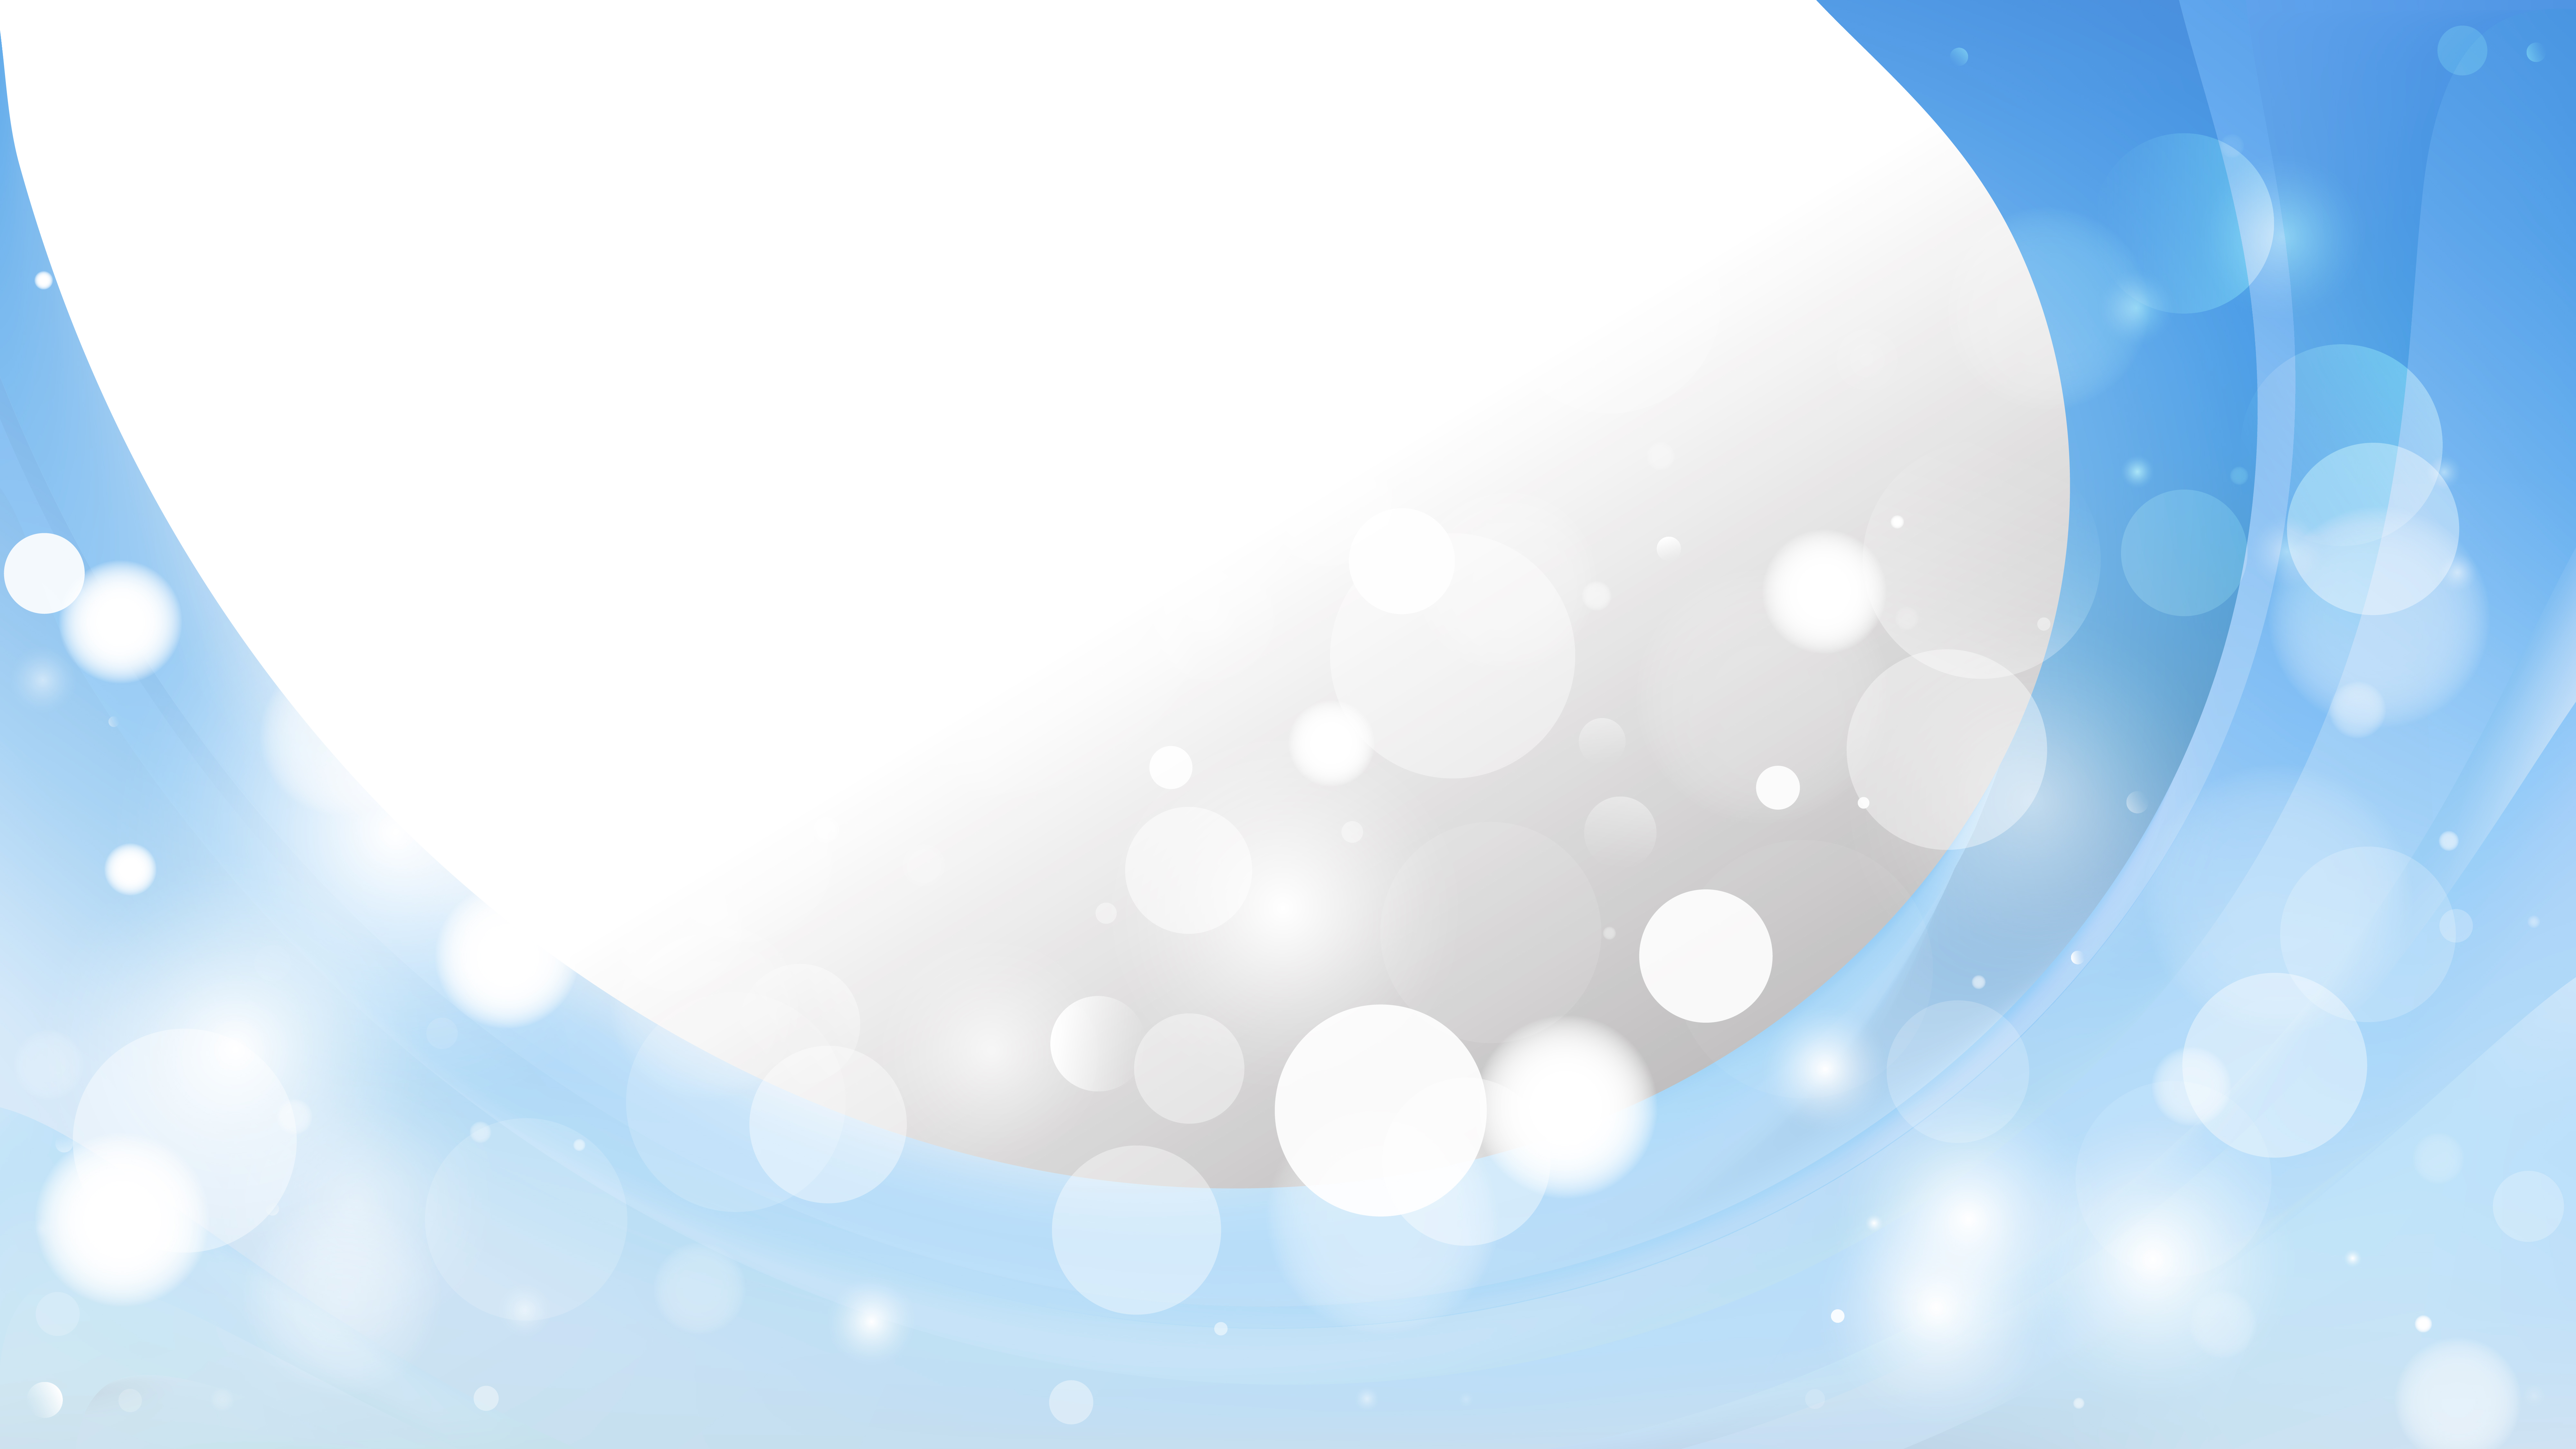 Light Blue Business Background Template Vector Illustration 8000x4500